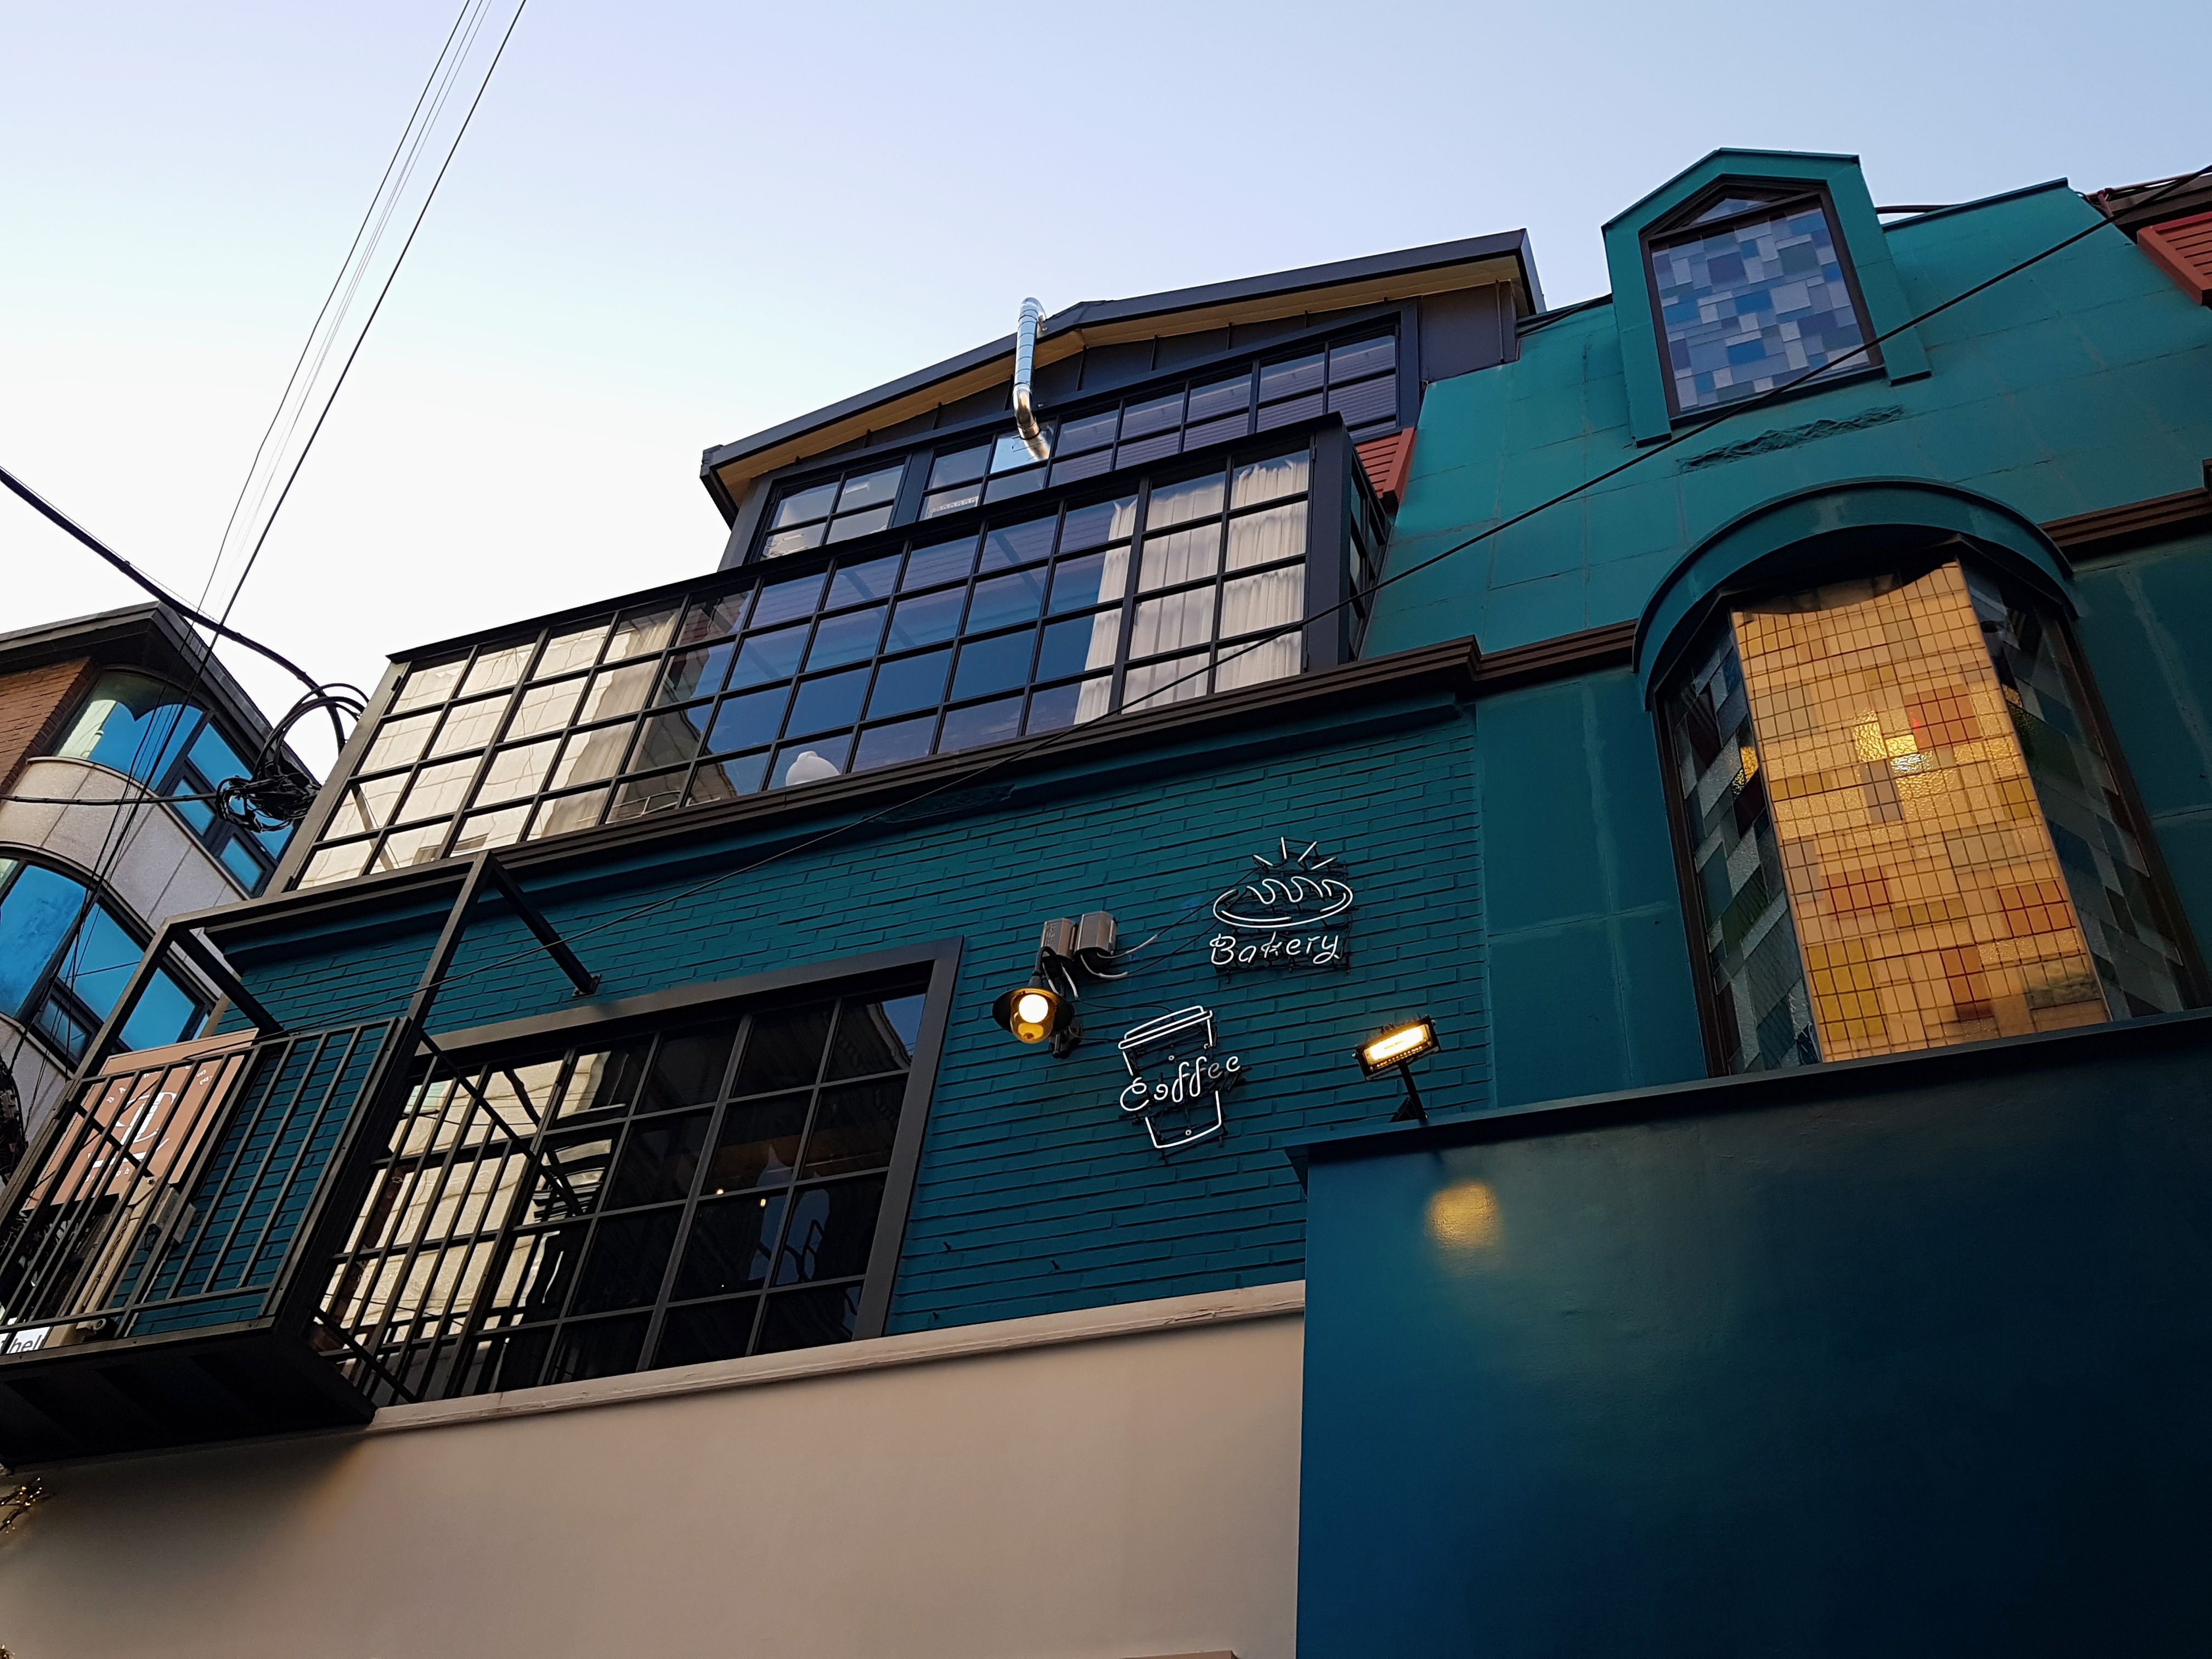 Vintage European style cafe in Sinsa-dong garosu-gil road- Delight